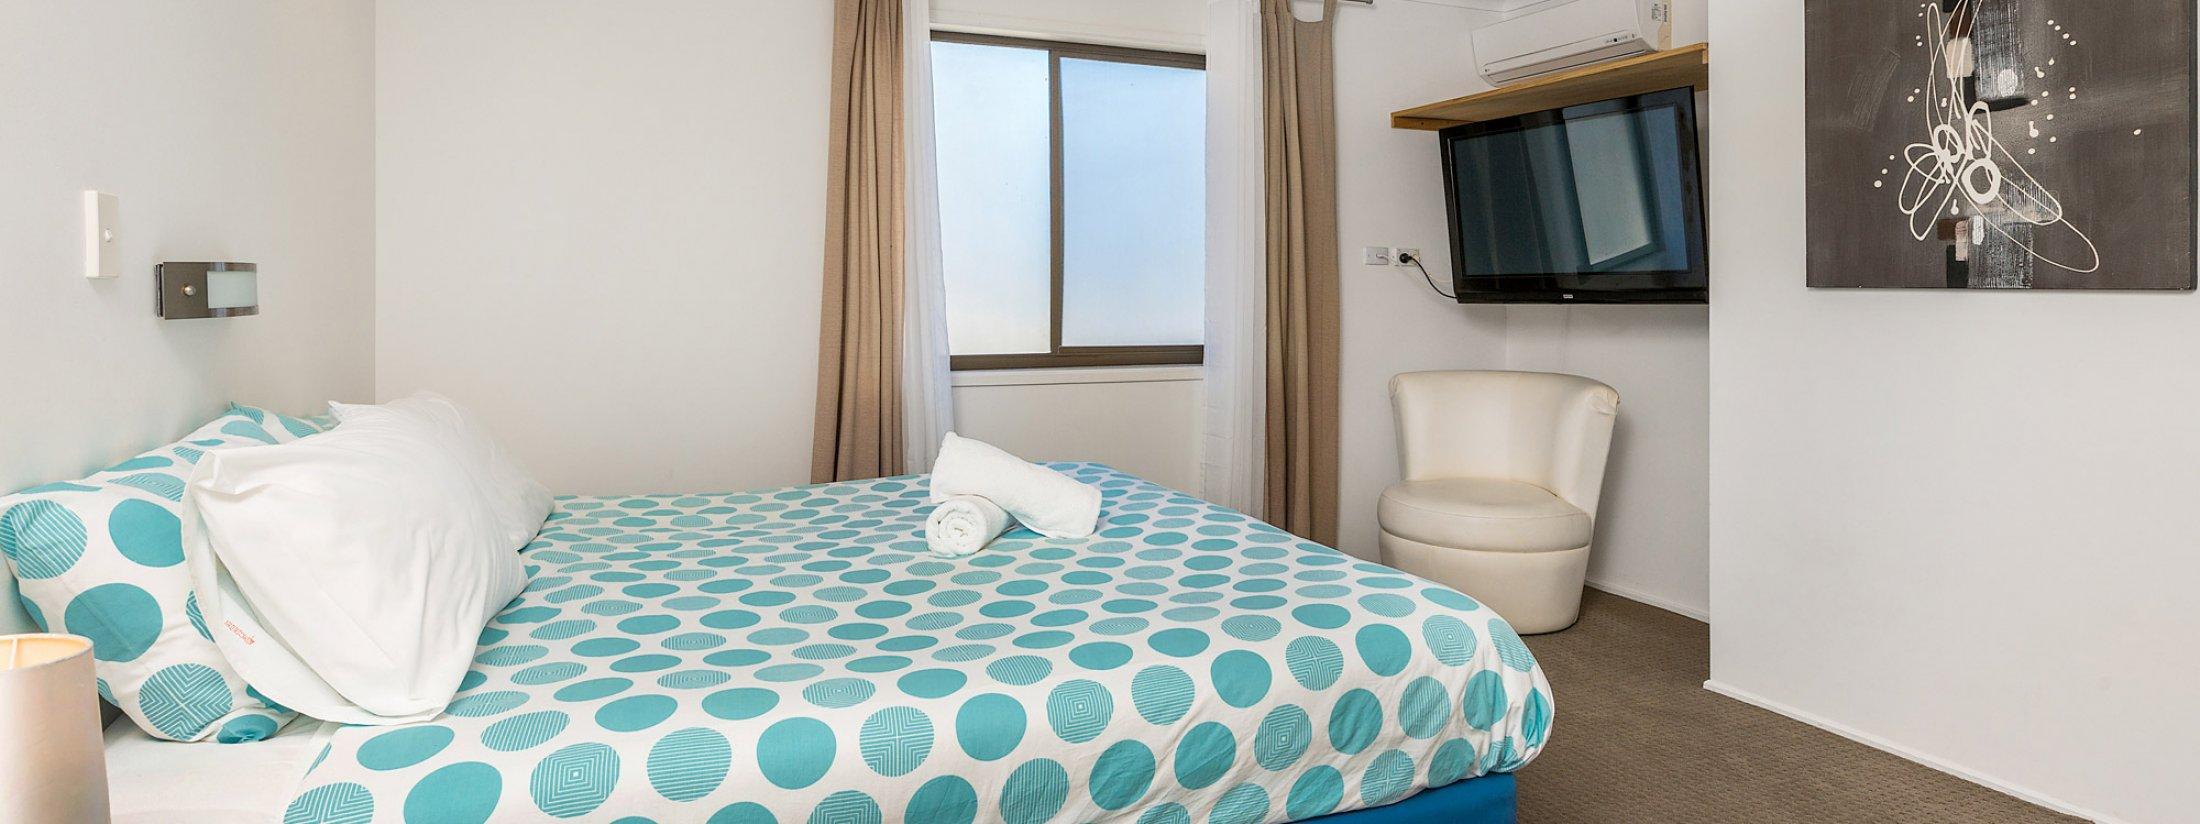 Bella on Banyan - Gold Coast - Bedroom 1